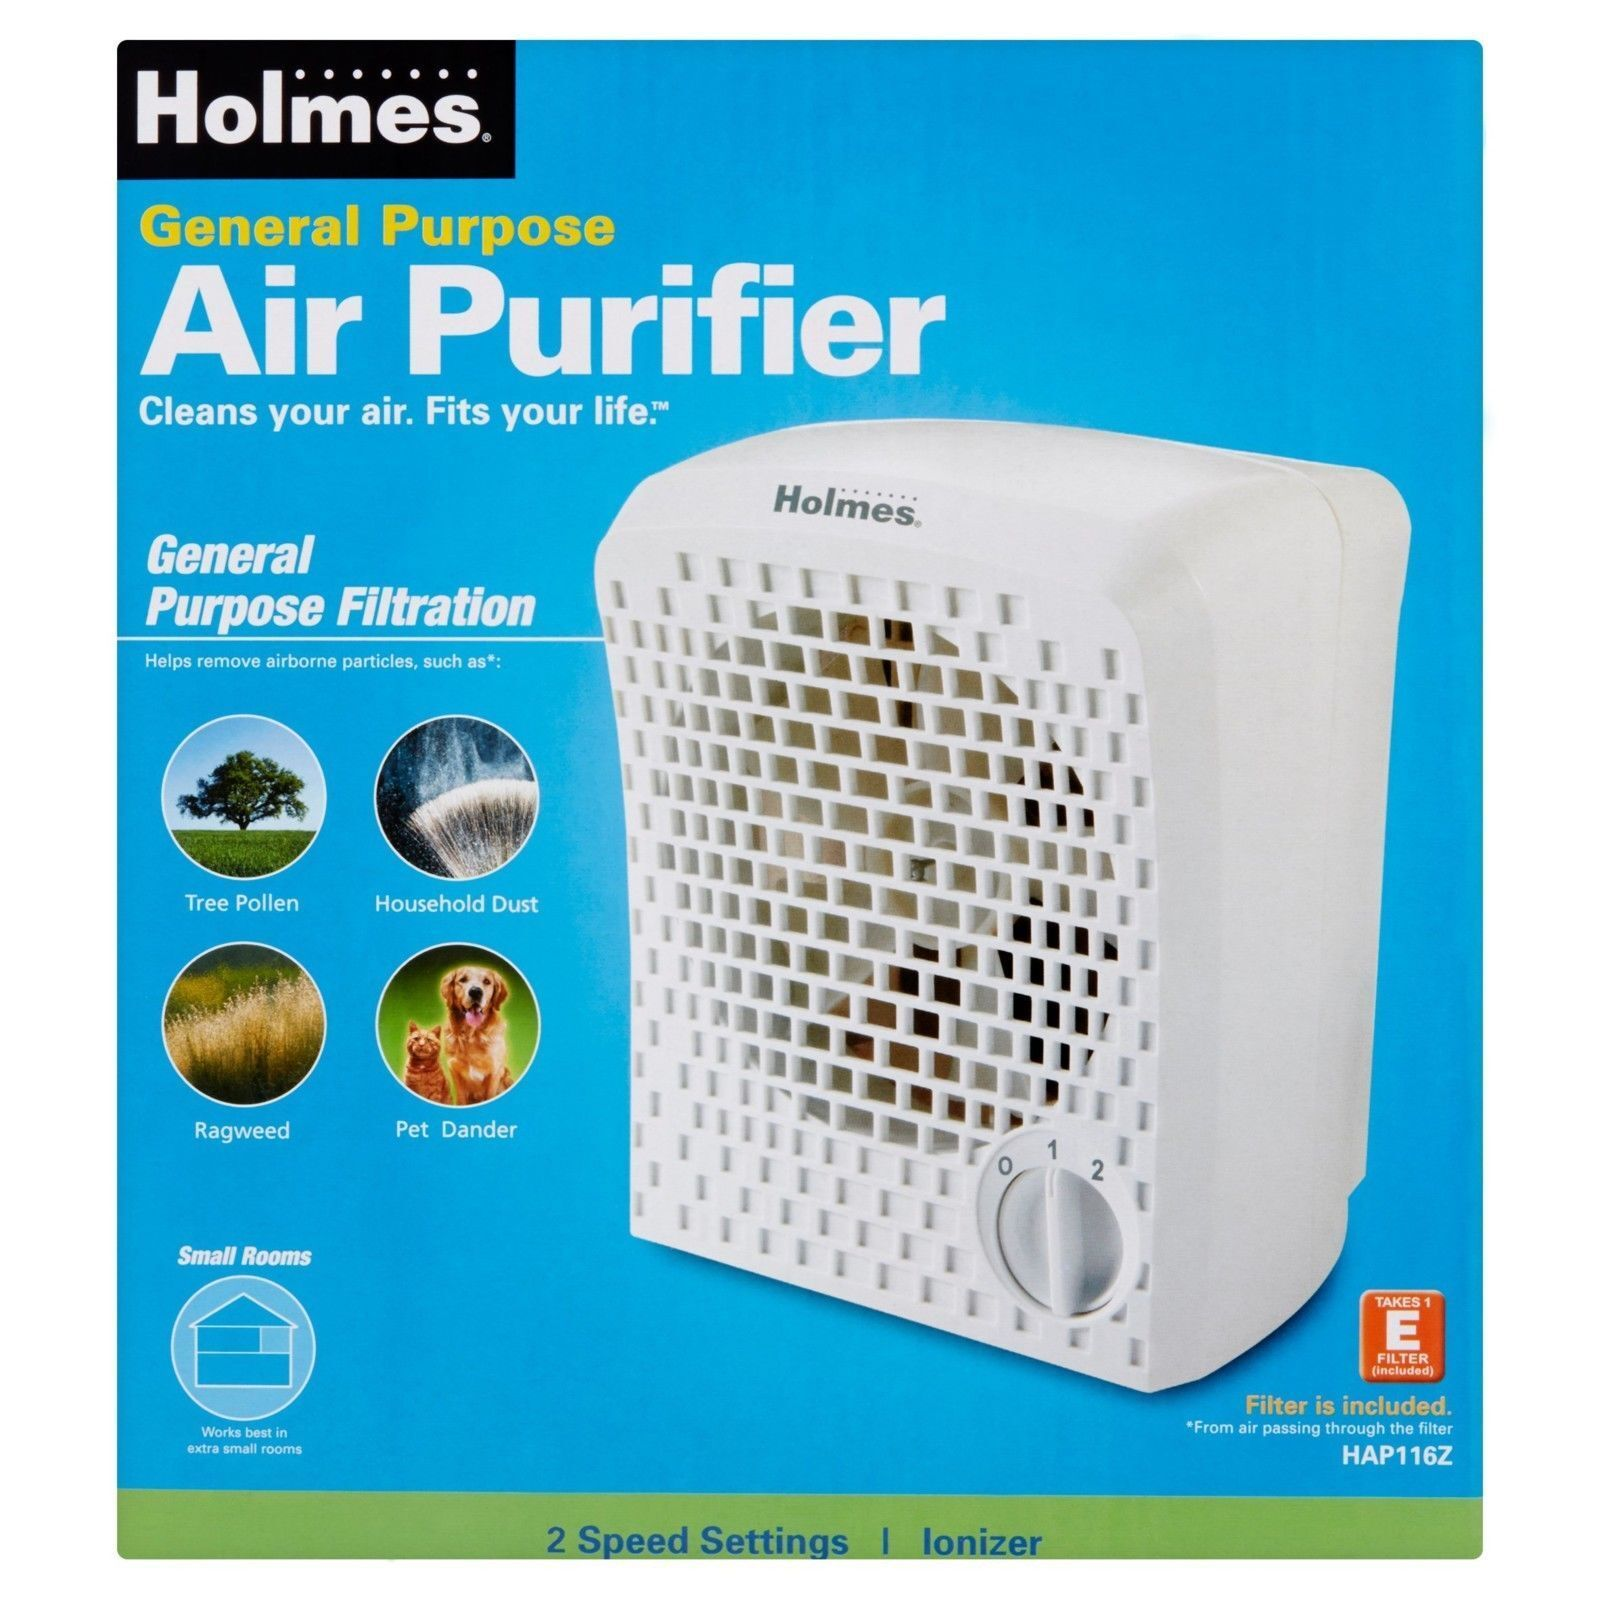 Holmes Air Purifier Hap116z